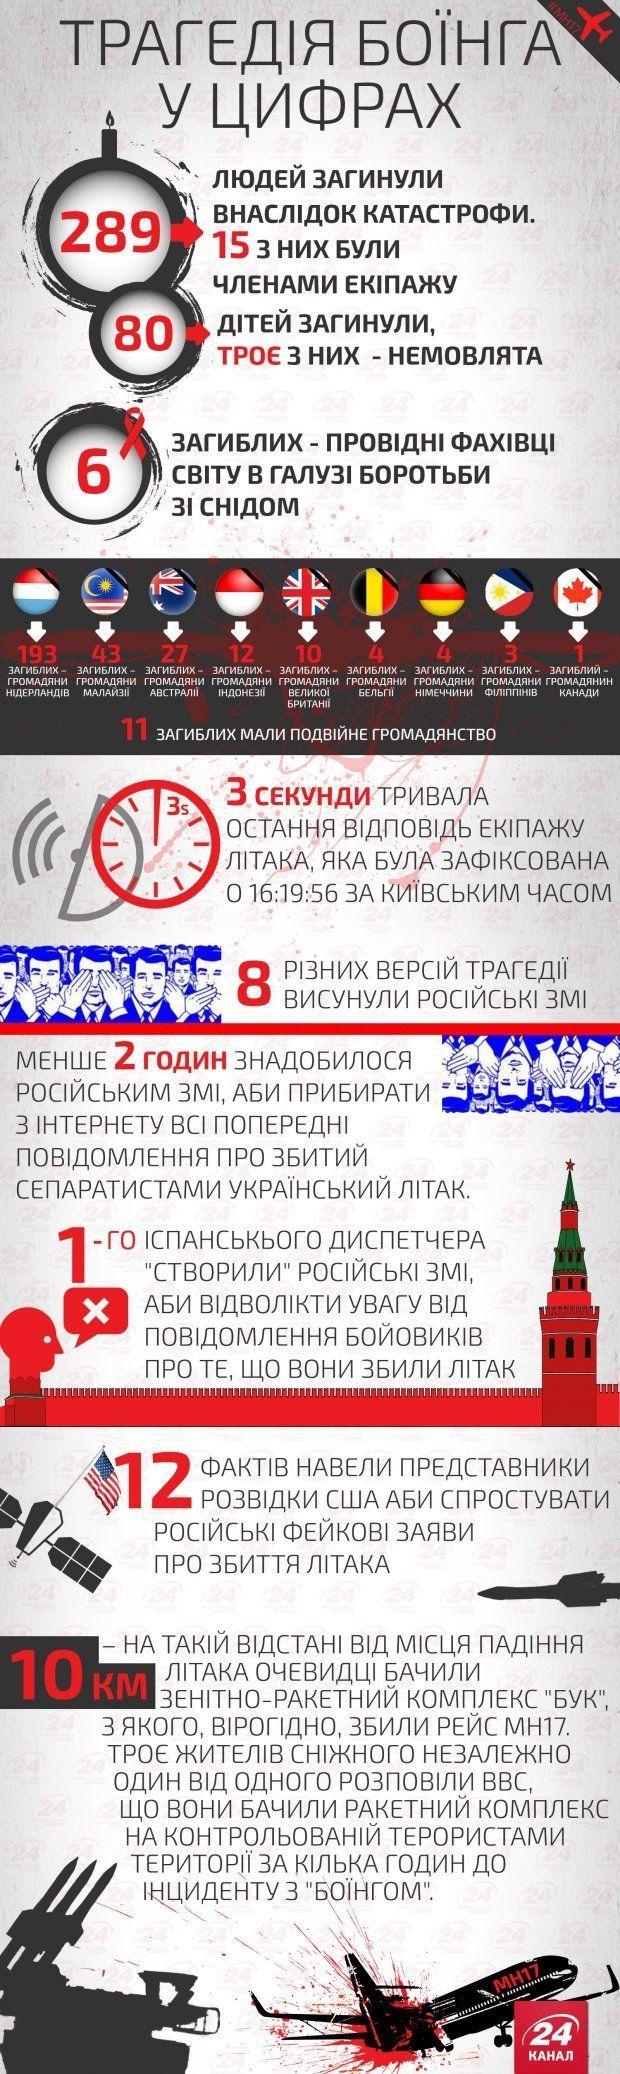 Юоїнг, катастрофа, Донбас